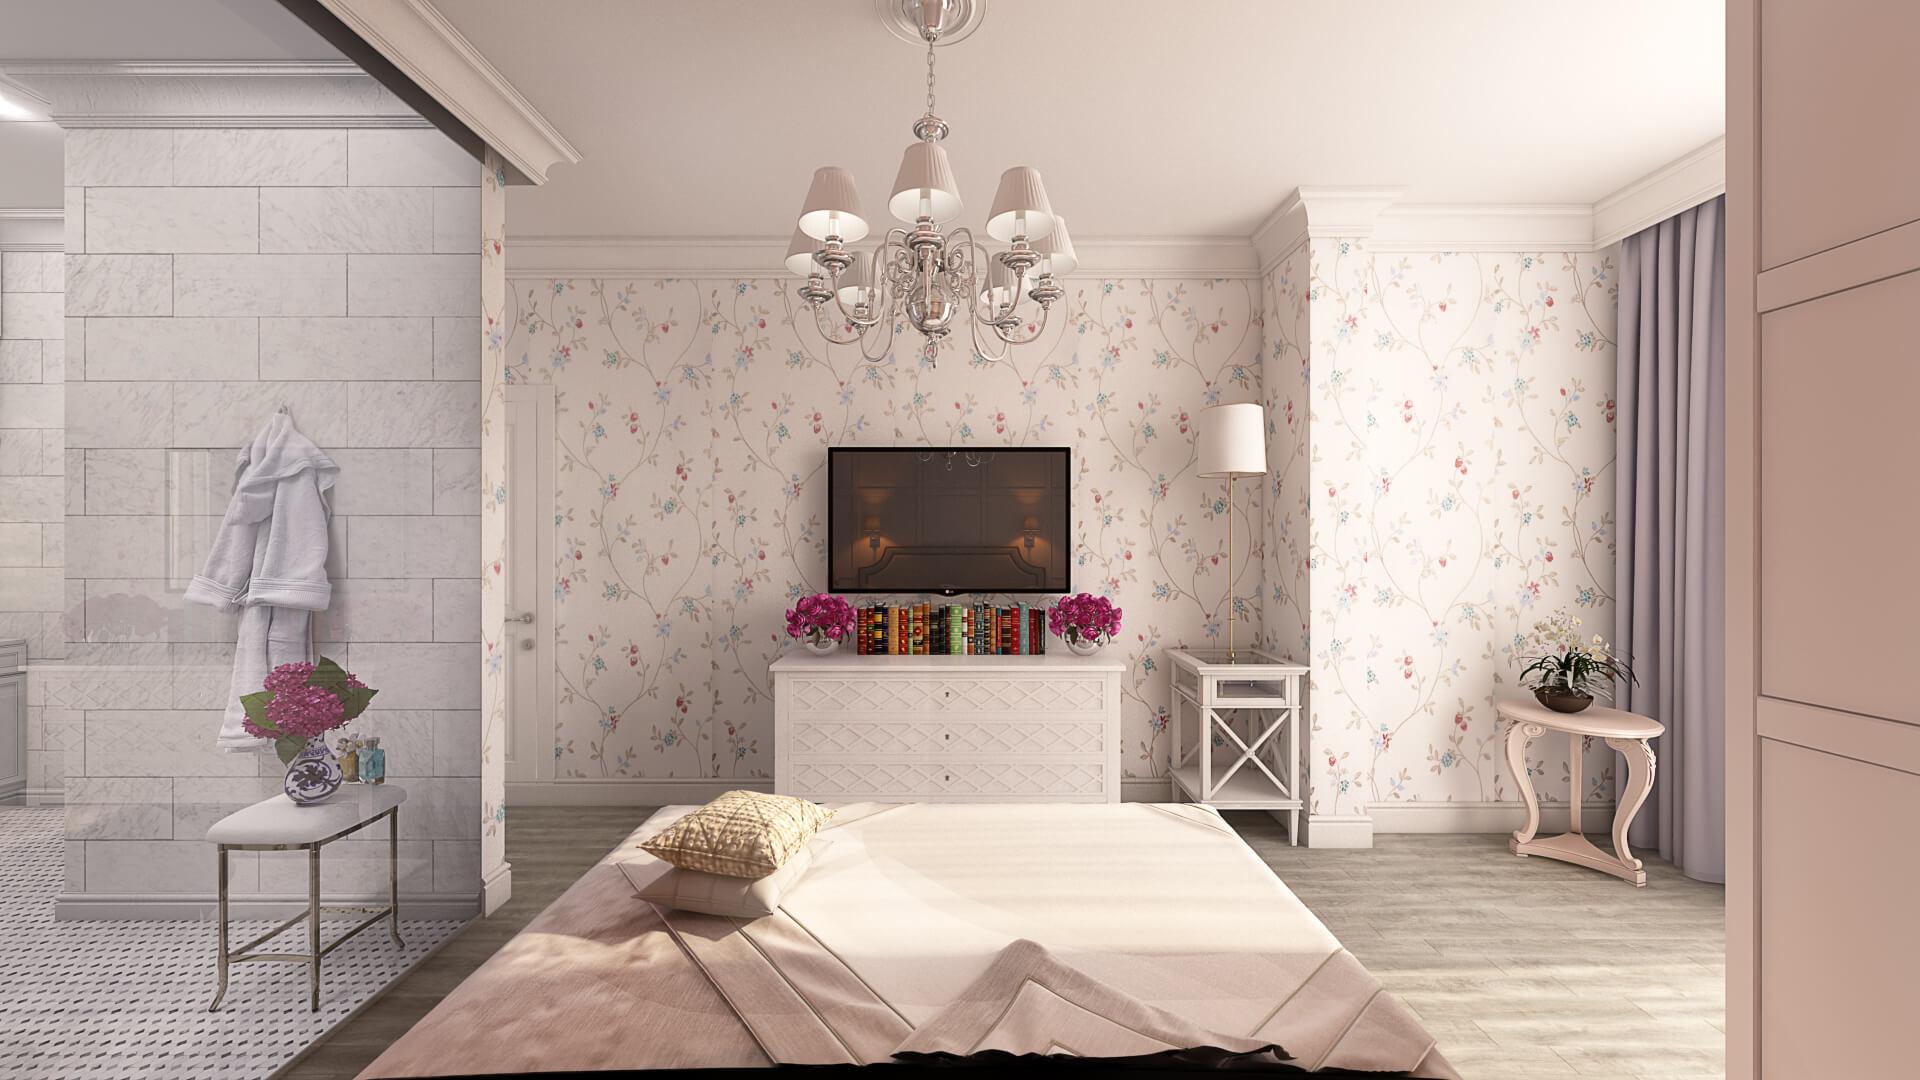 Проект Бульвар Фонтанов квартира 9